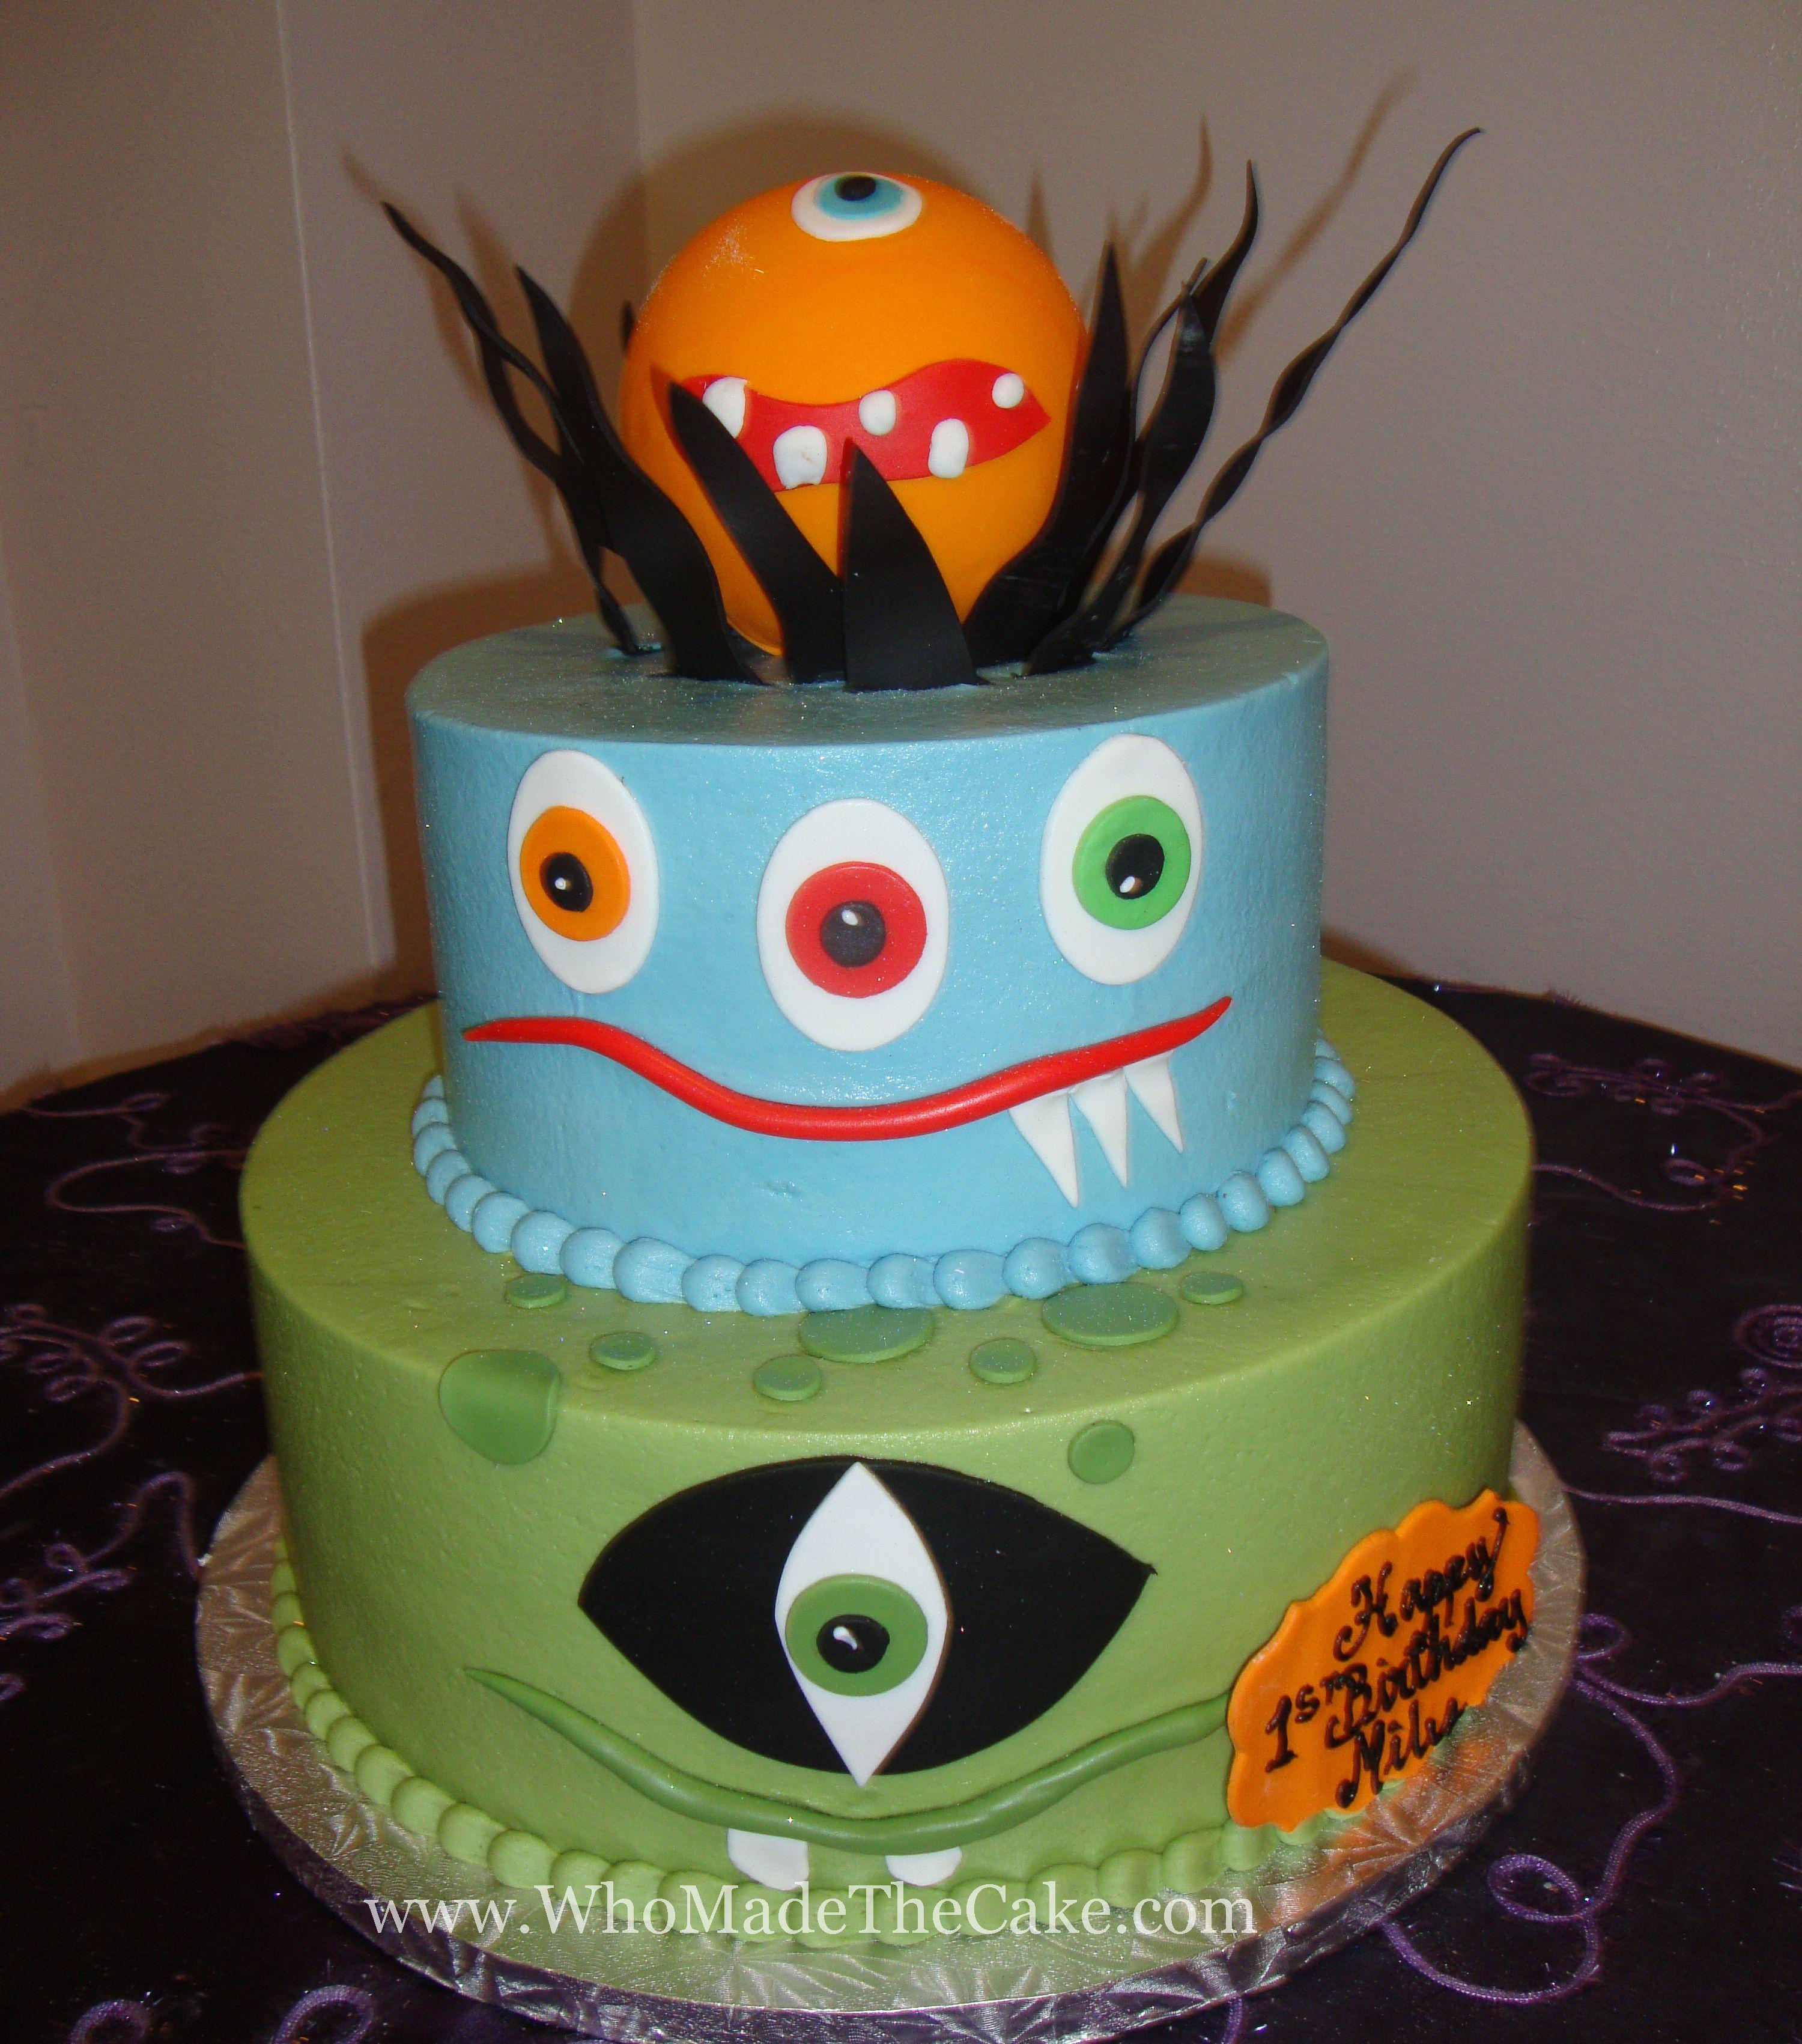 Monster theme birthday cake by www.WhoMadeTheCake.com. #monsterbirthdaycake